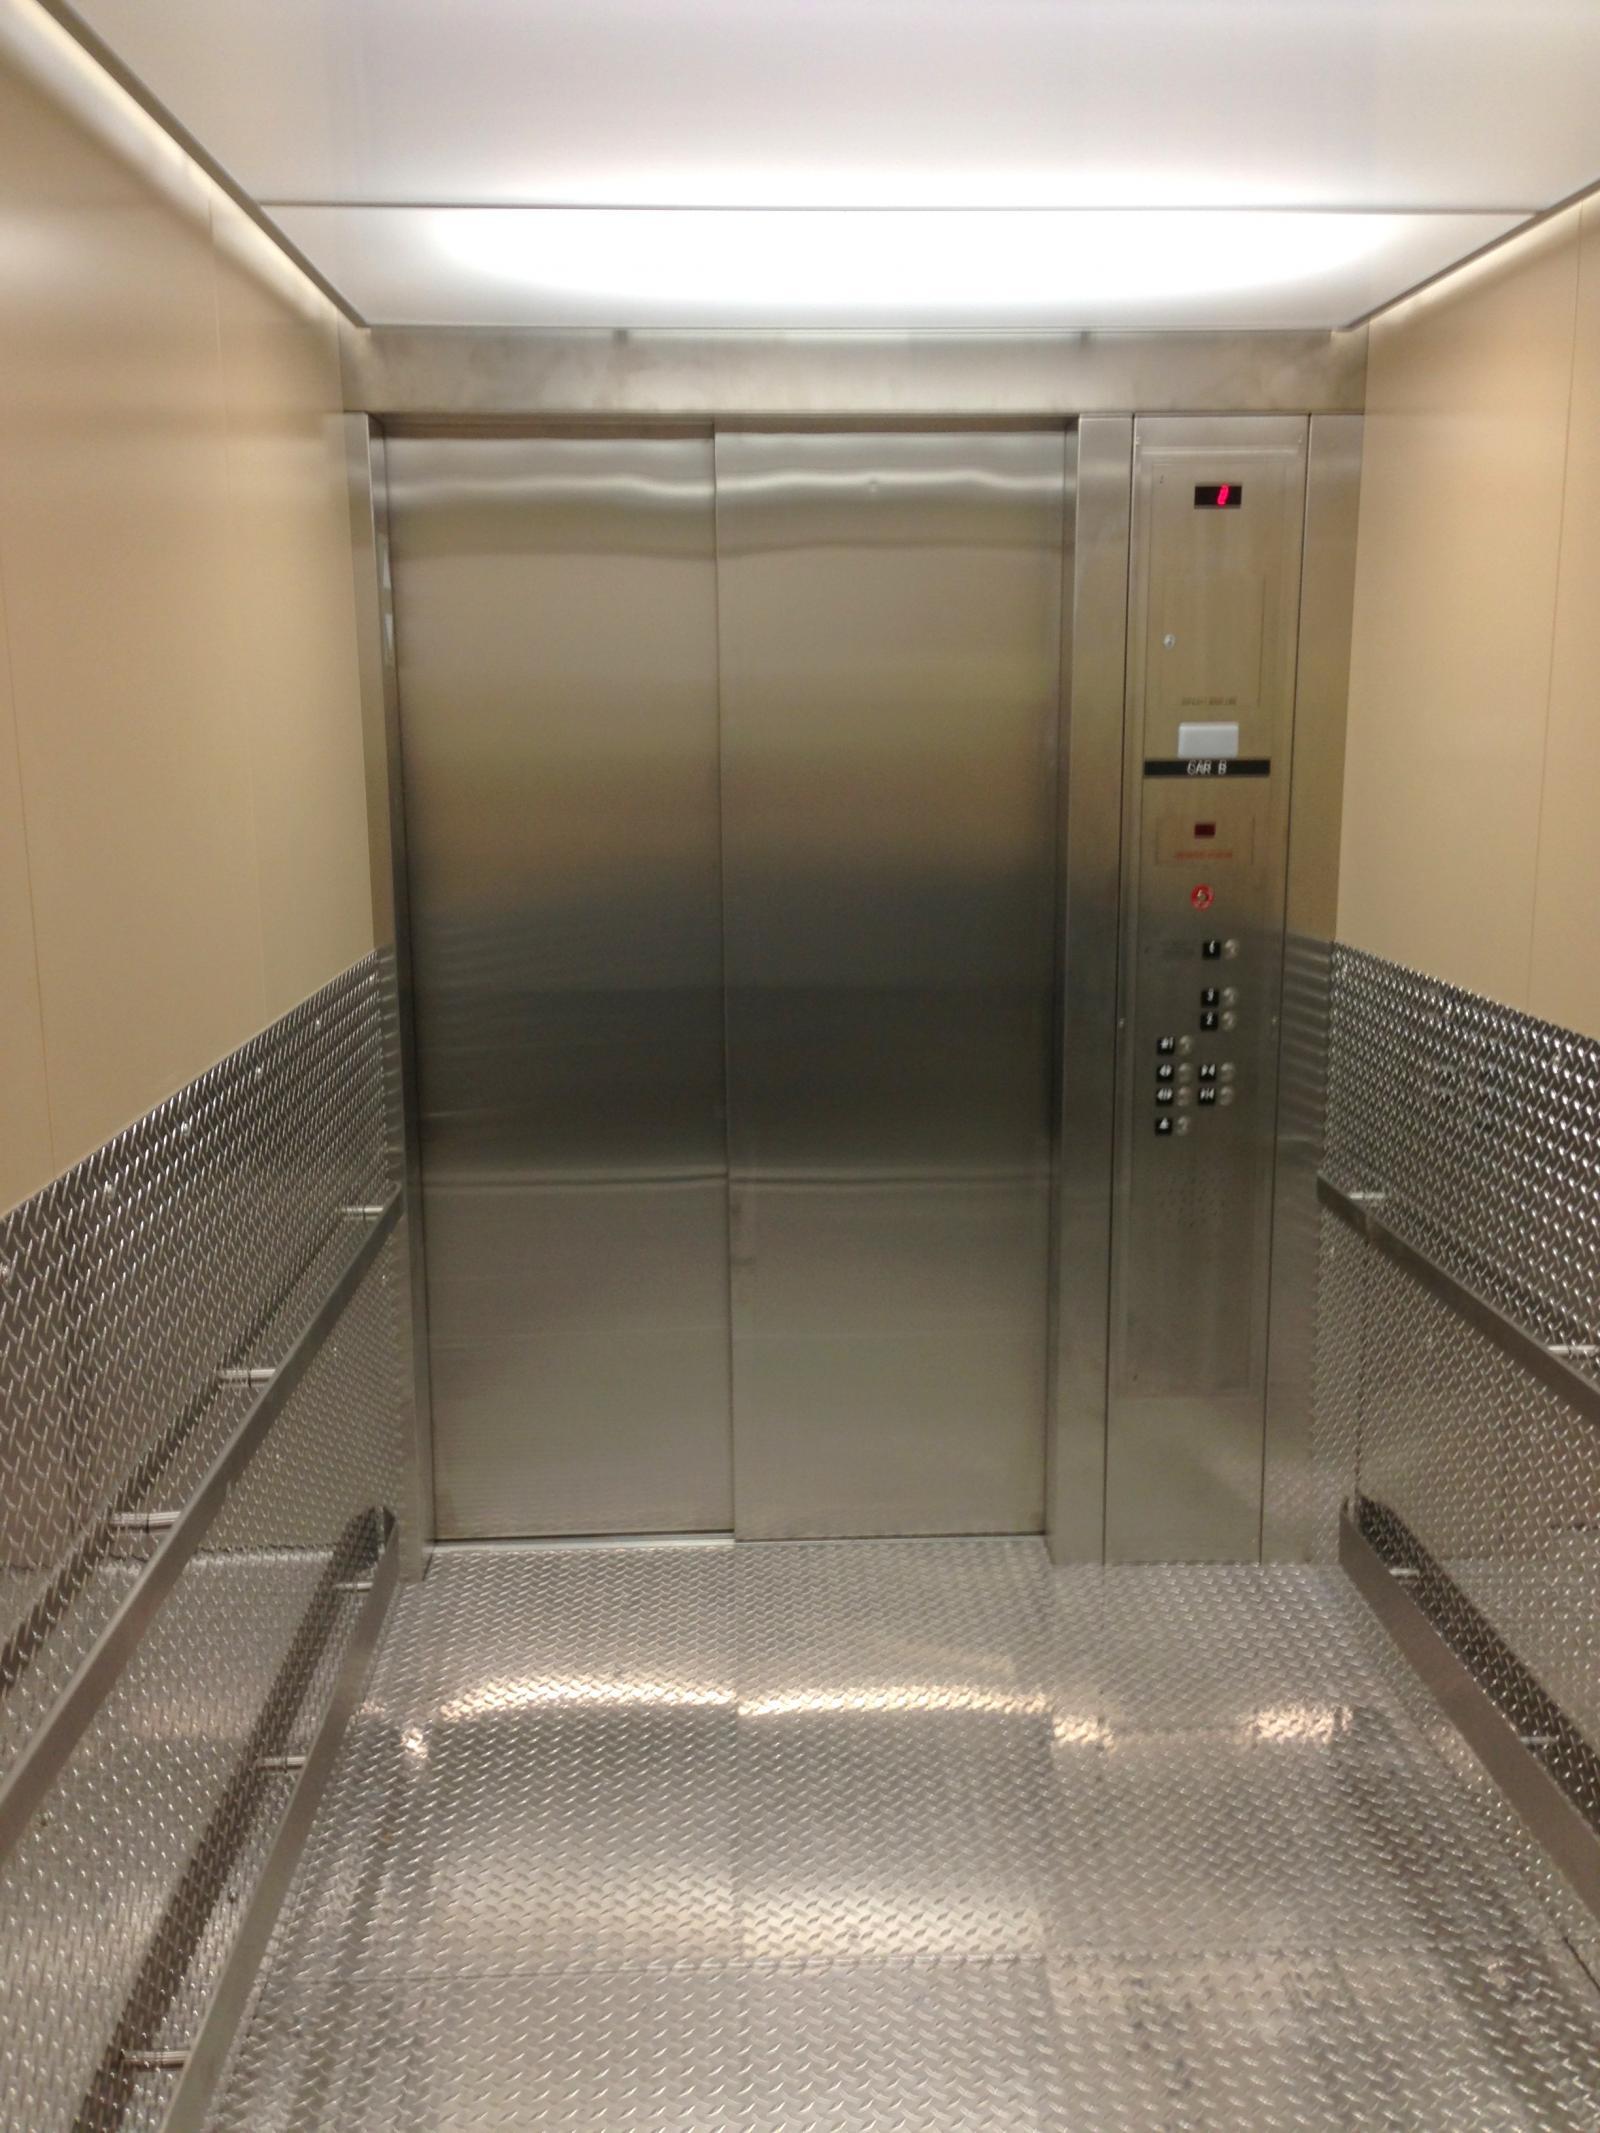 interiorelevator.jpg